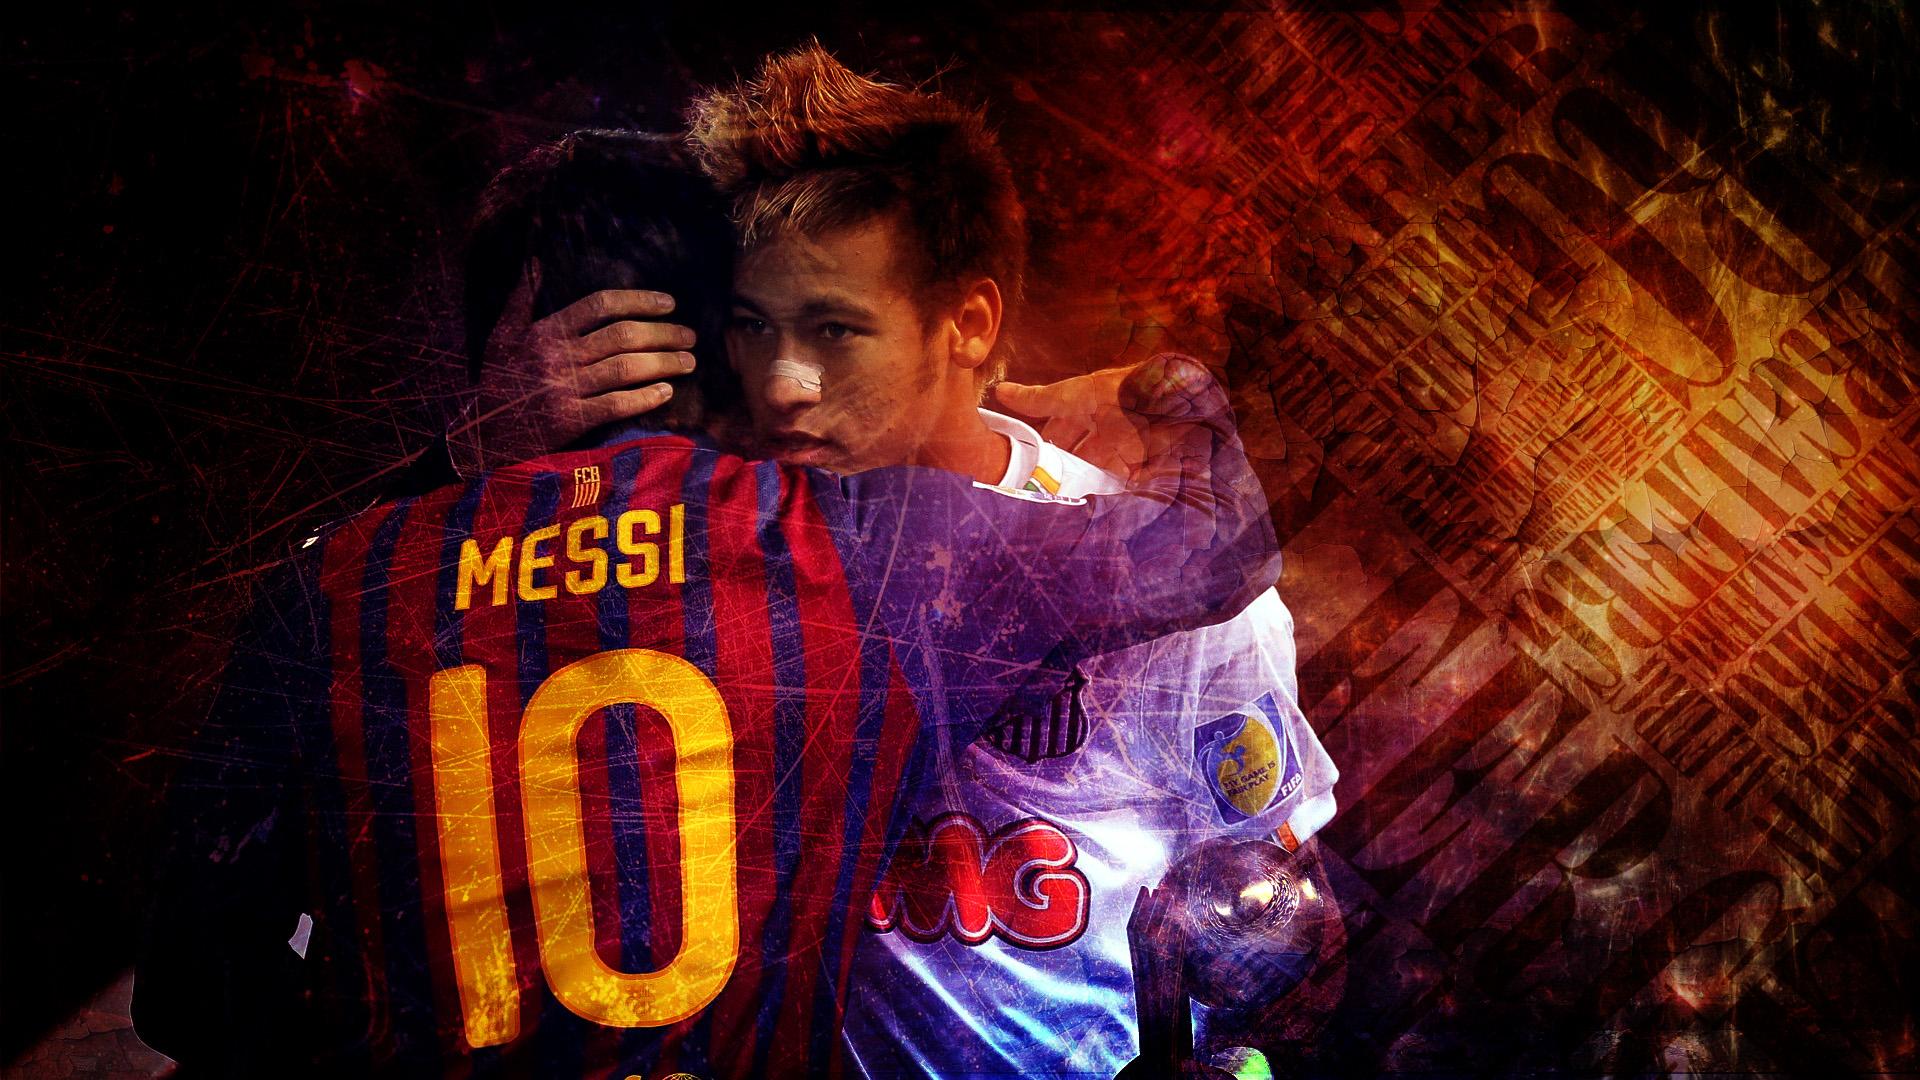 Hd wallpaper neymar - Neymar Messi Ronaldo 2013